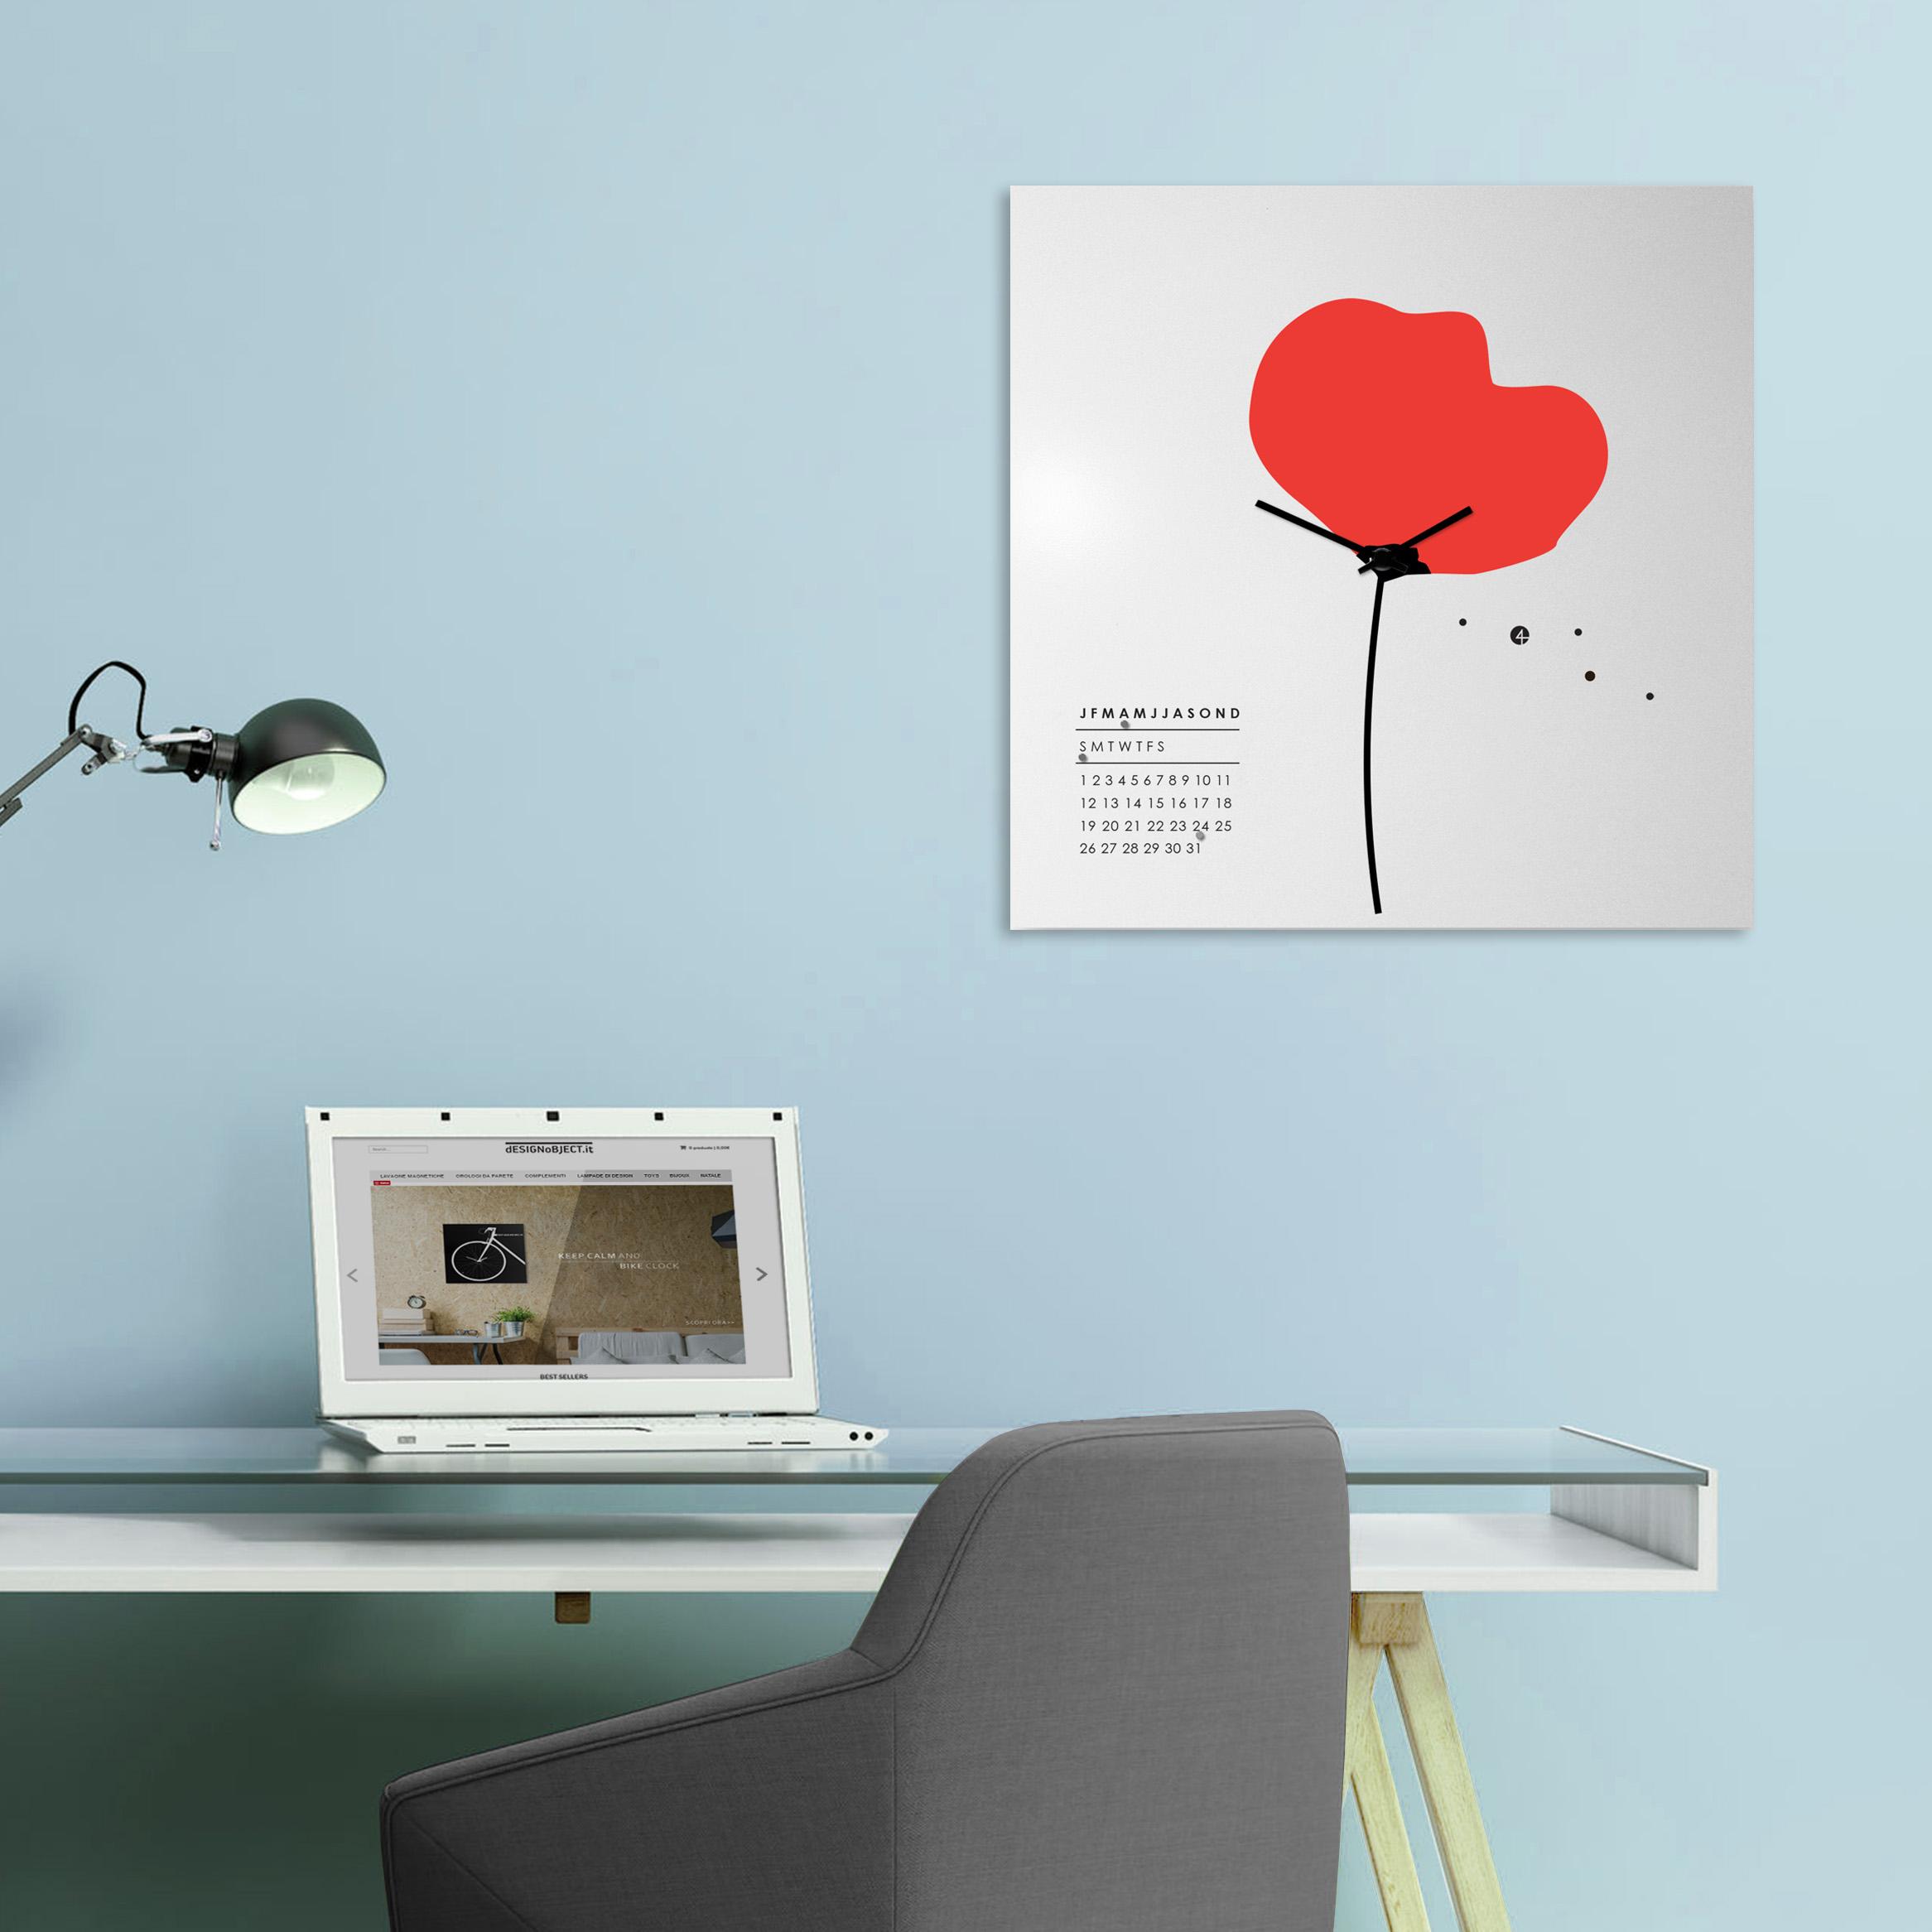 Orologio da parete di design calendario perpetuo designobject - Orologio design parete ...